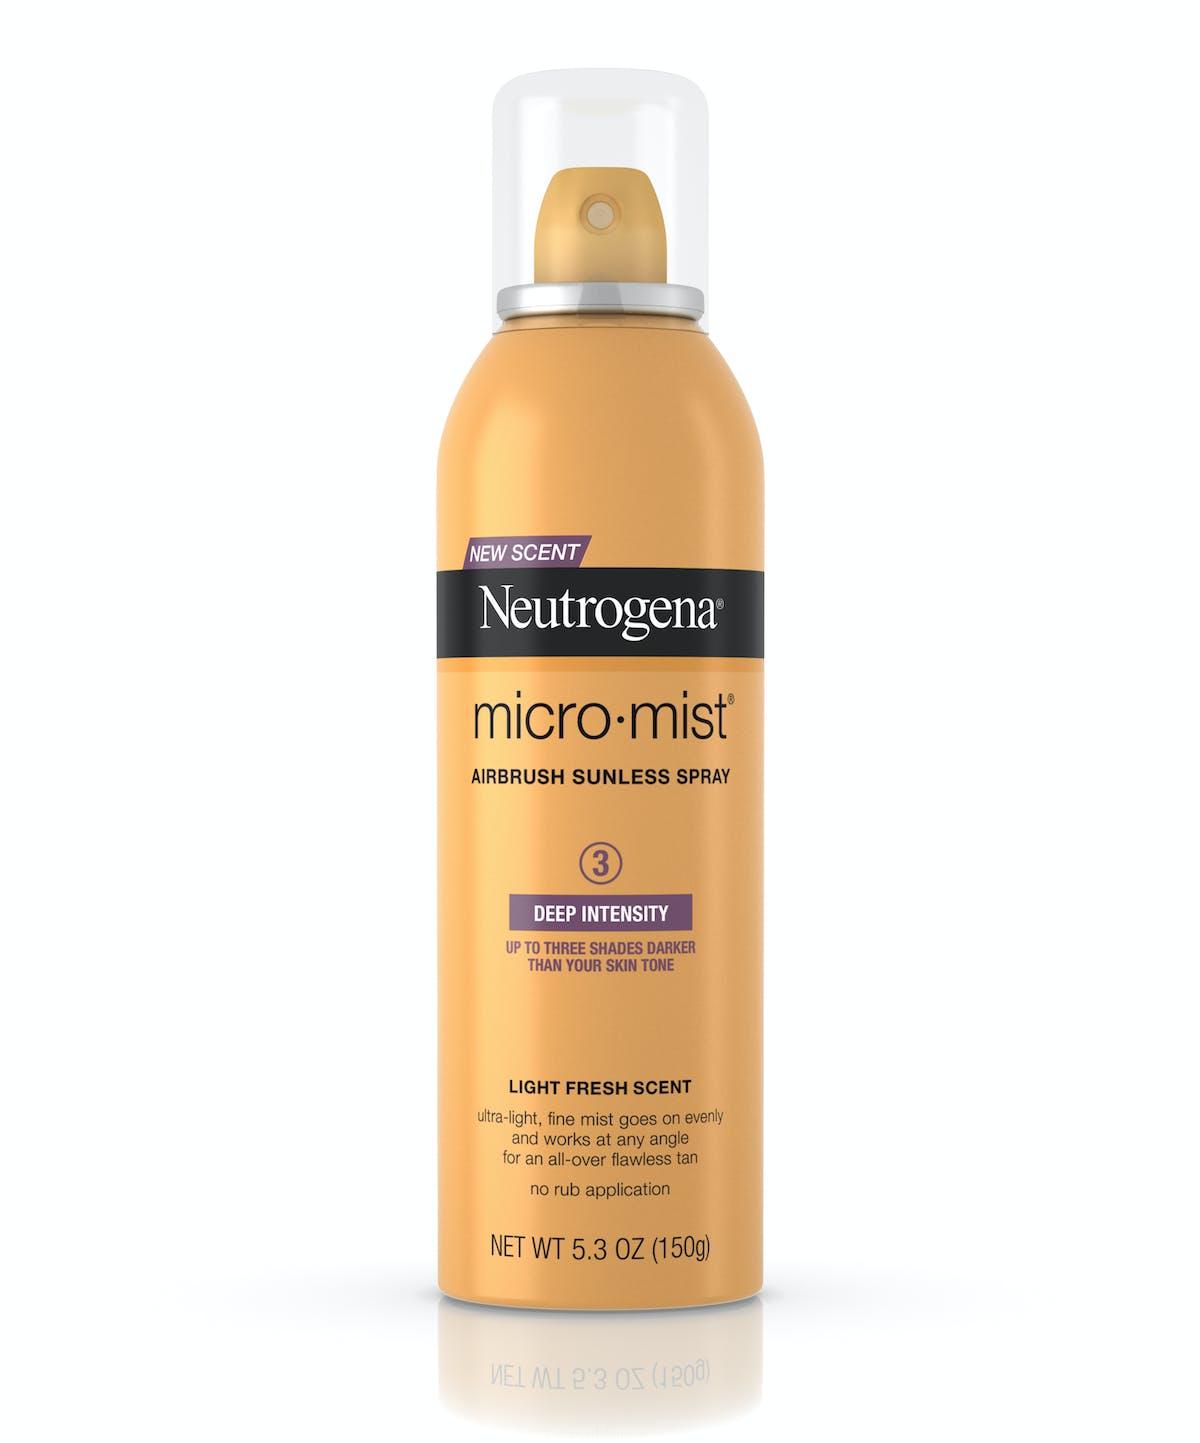 micromist airbrush sunless tan self tanning spray neutrogena